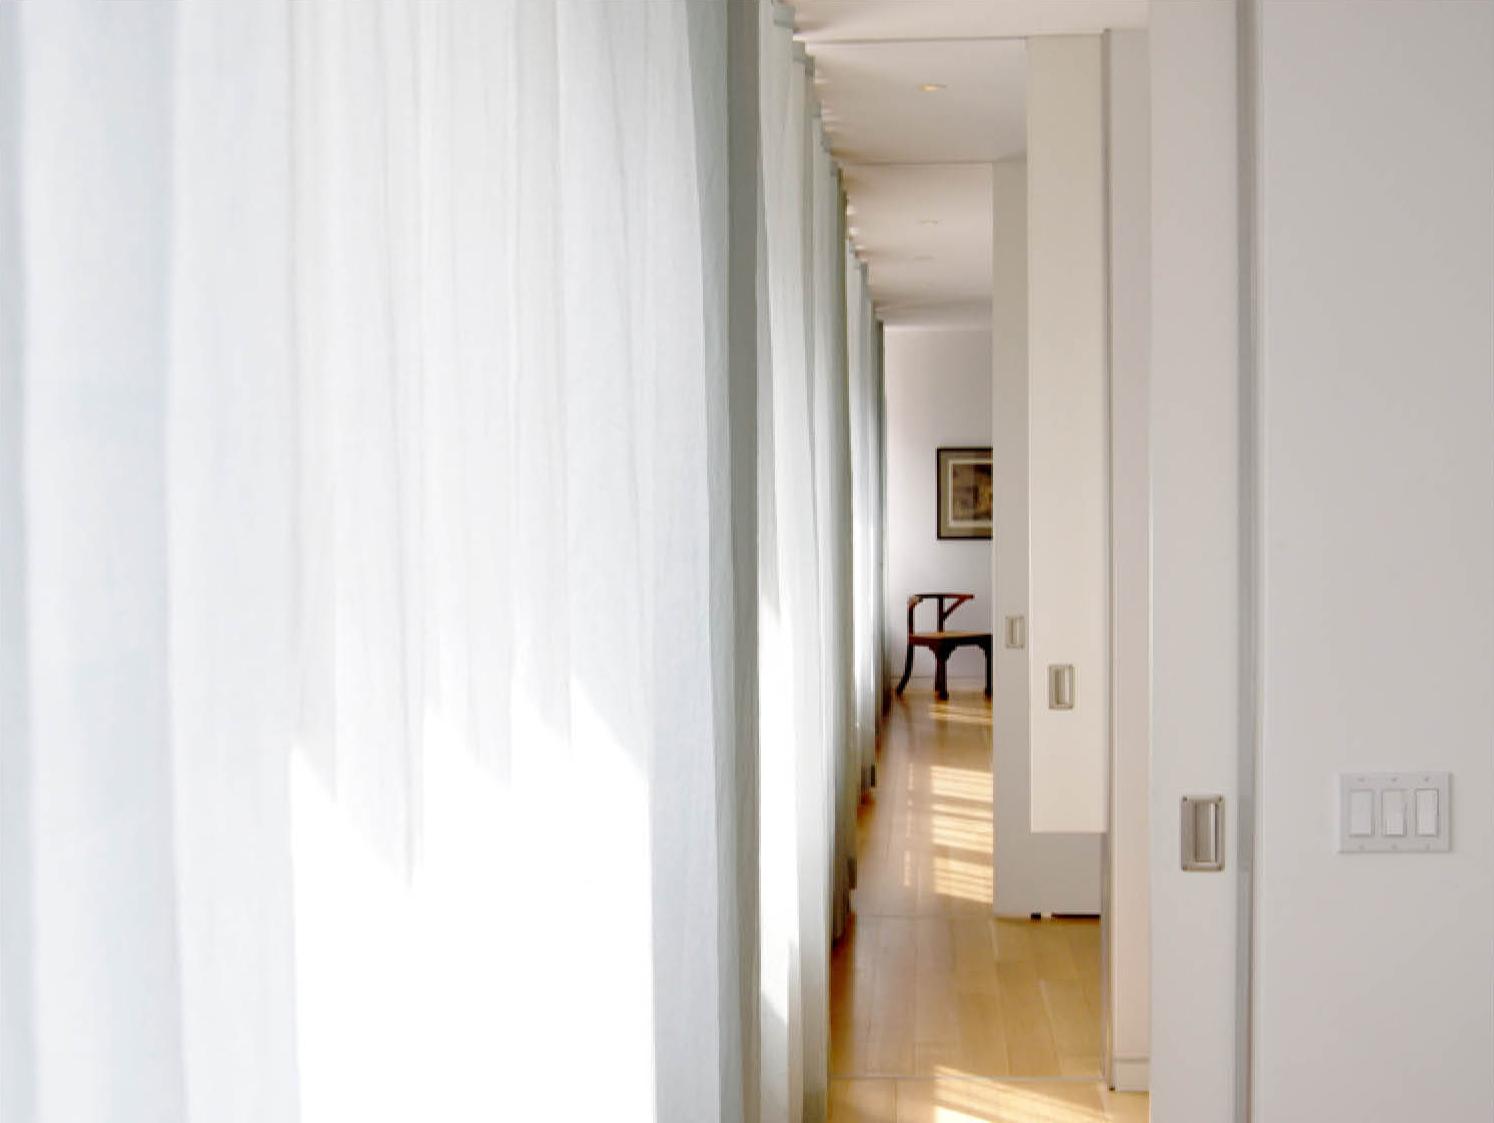 brooklyn heights residence4.jpg